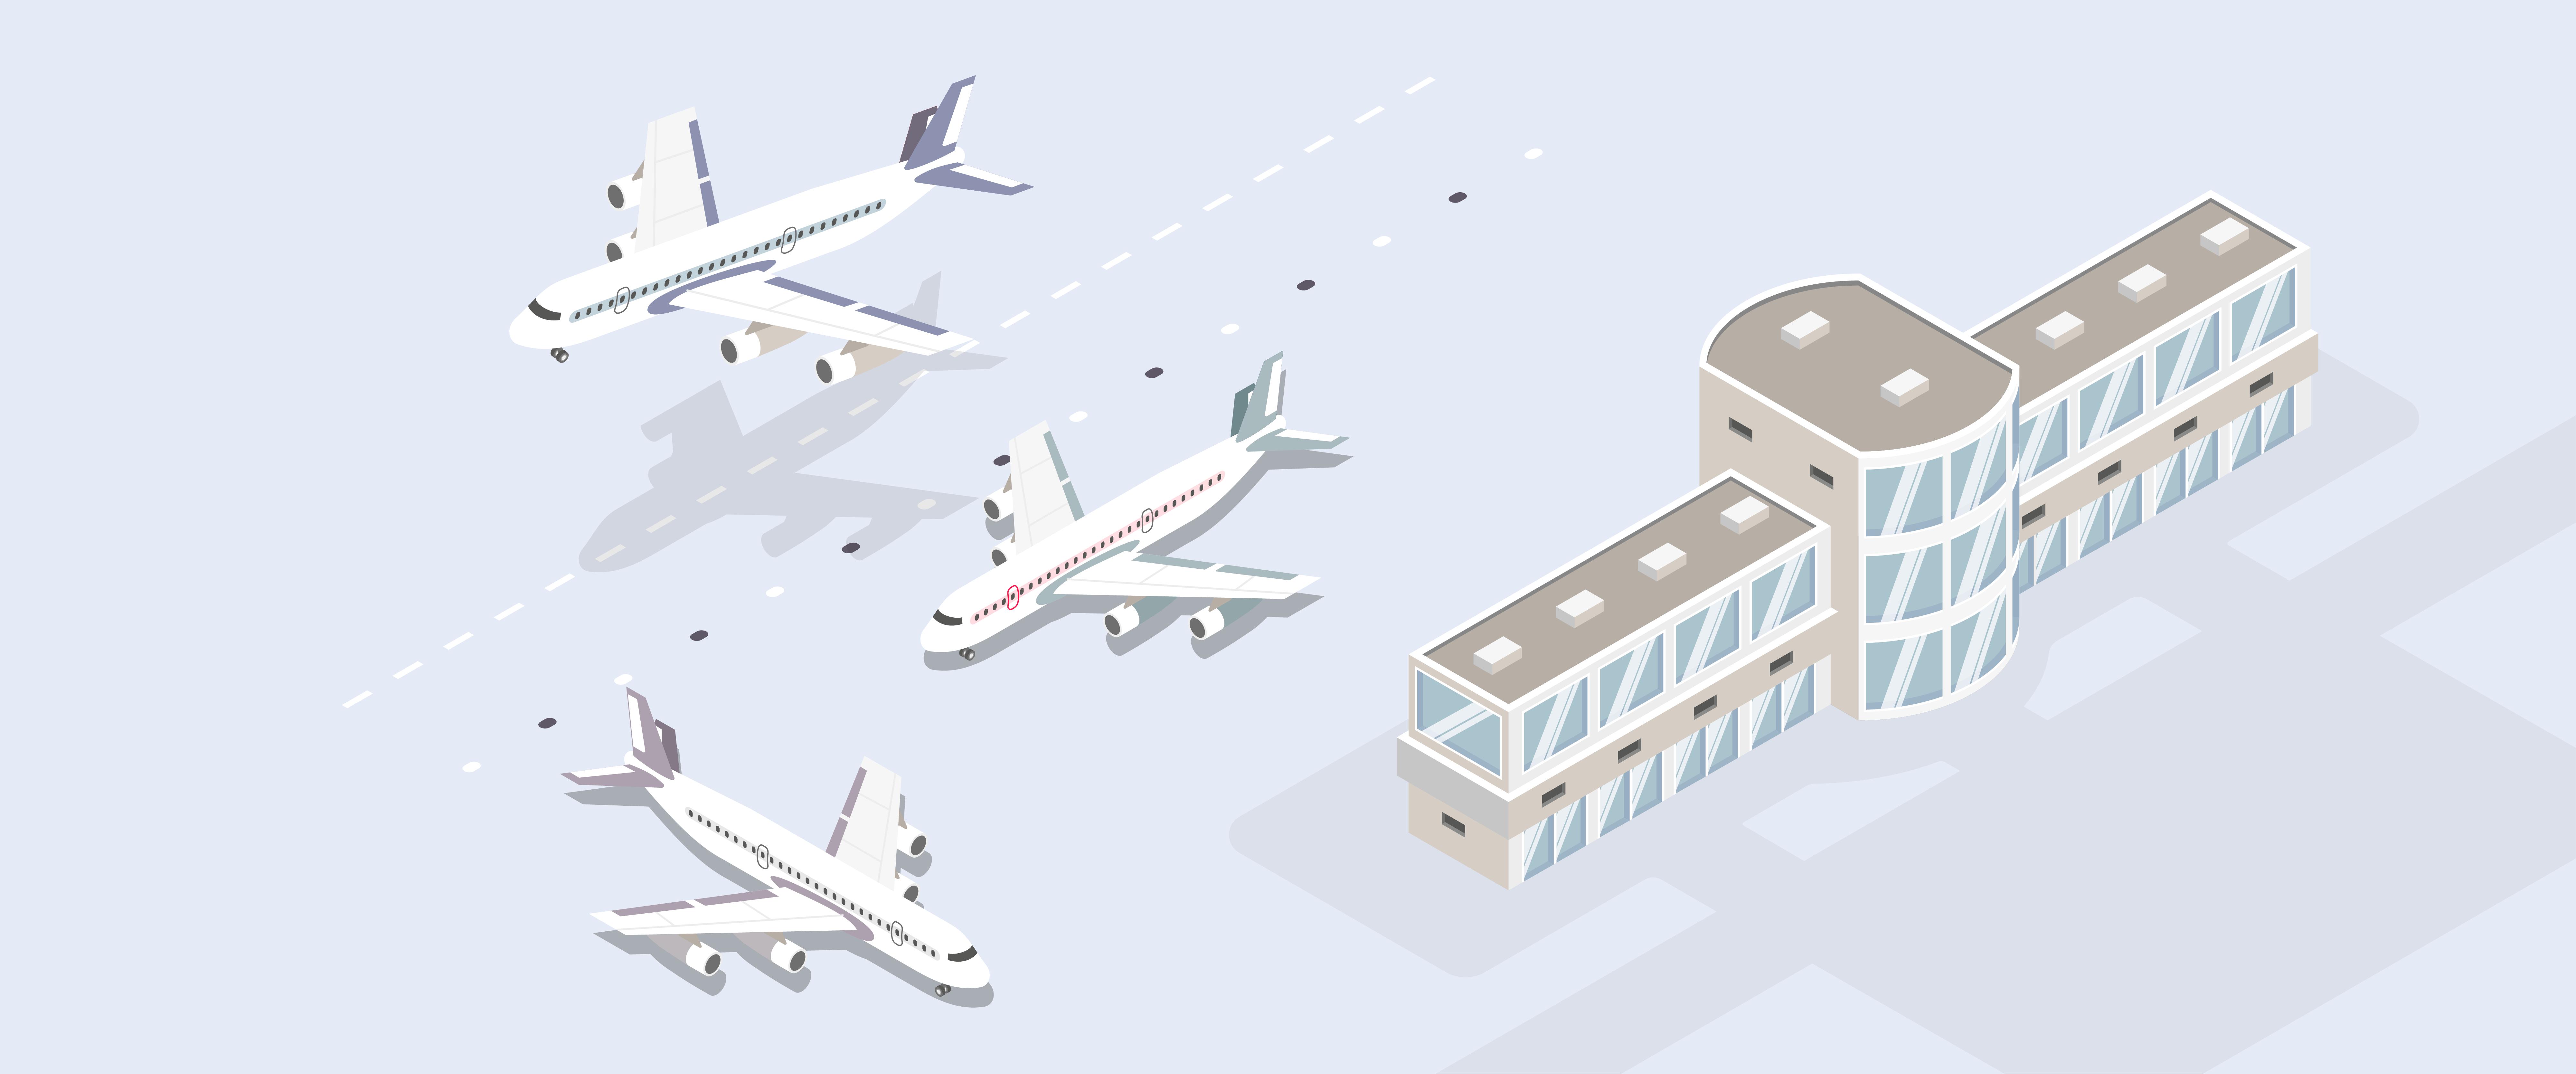 https://recfaces.com/wp-content/uploads/2021/05/increasing-airport-capacity.png